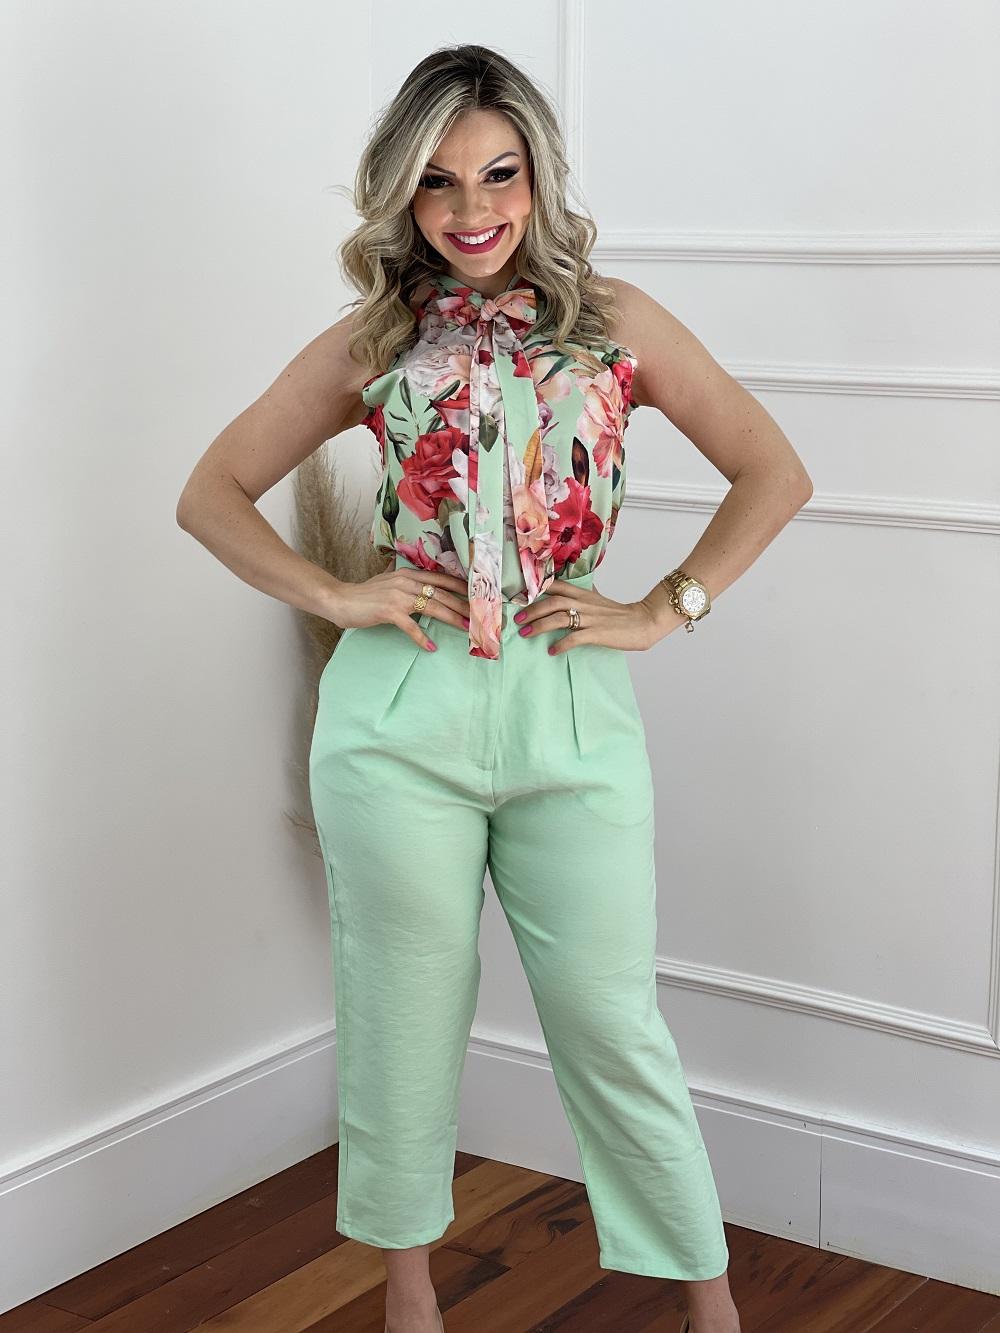 Look Pronto: Blusa Cava Americana Estampa Floral Amarra Colo Verde + Calça Pantacourt Candy Colors Verde